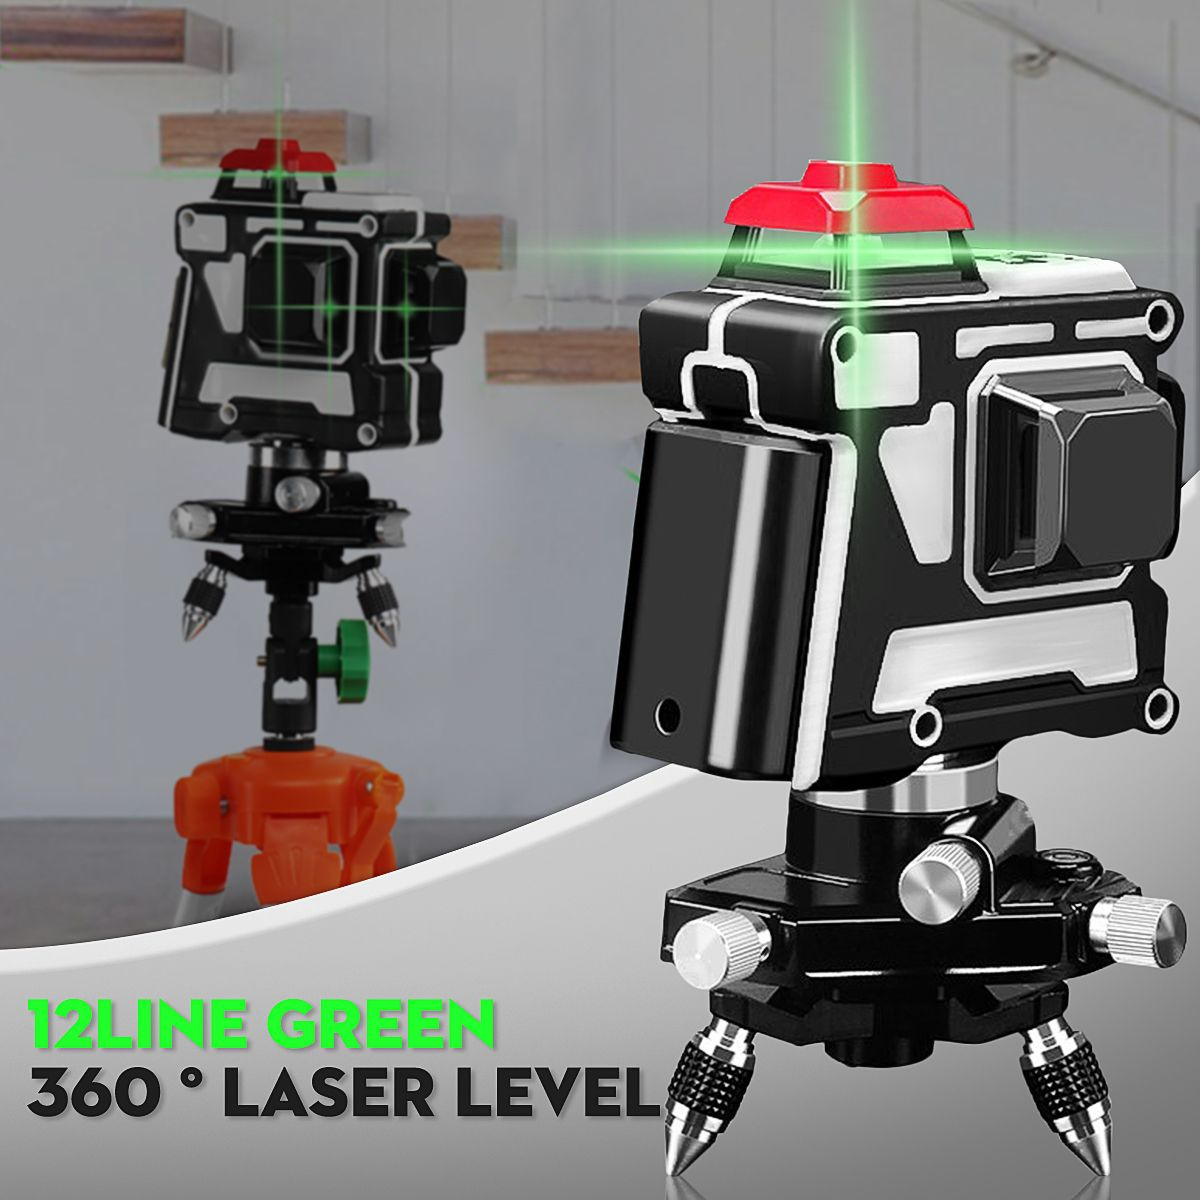 360 12 Line 3d 120x Green Light Laser Level Outdoor Cross Measure Tool W Tripod Measurement Analysis Instruments From Tools On Banggood Com Laser Lights Laser Levels Wellness Design